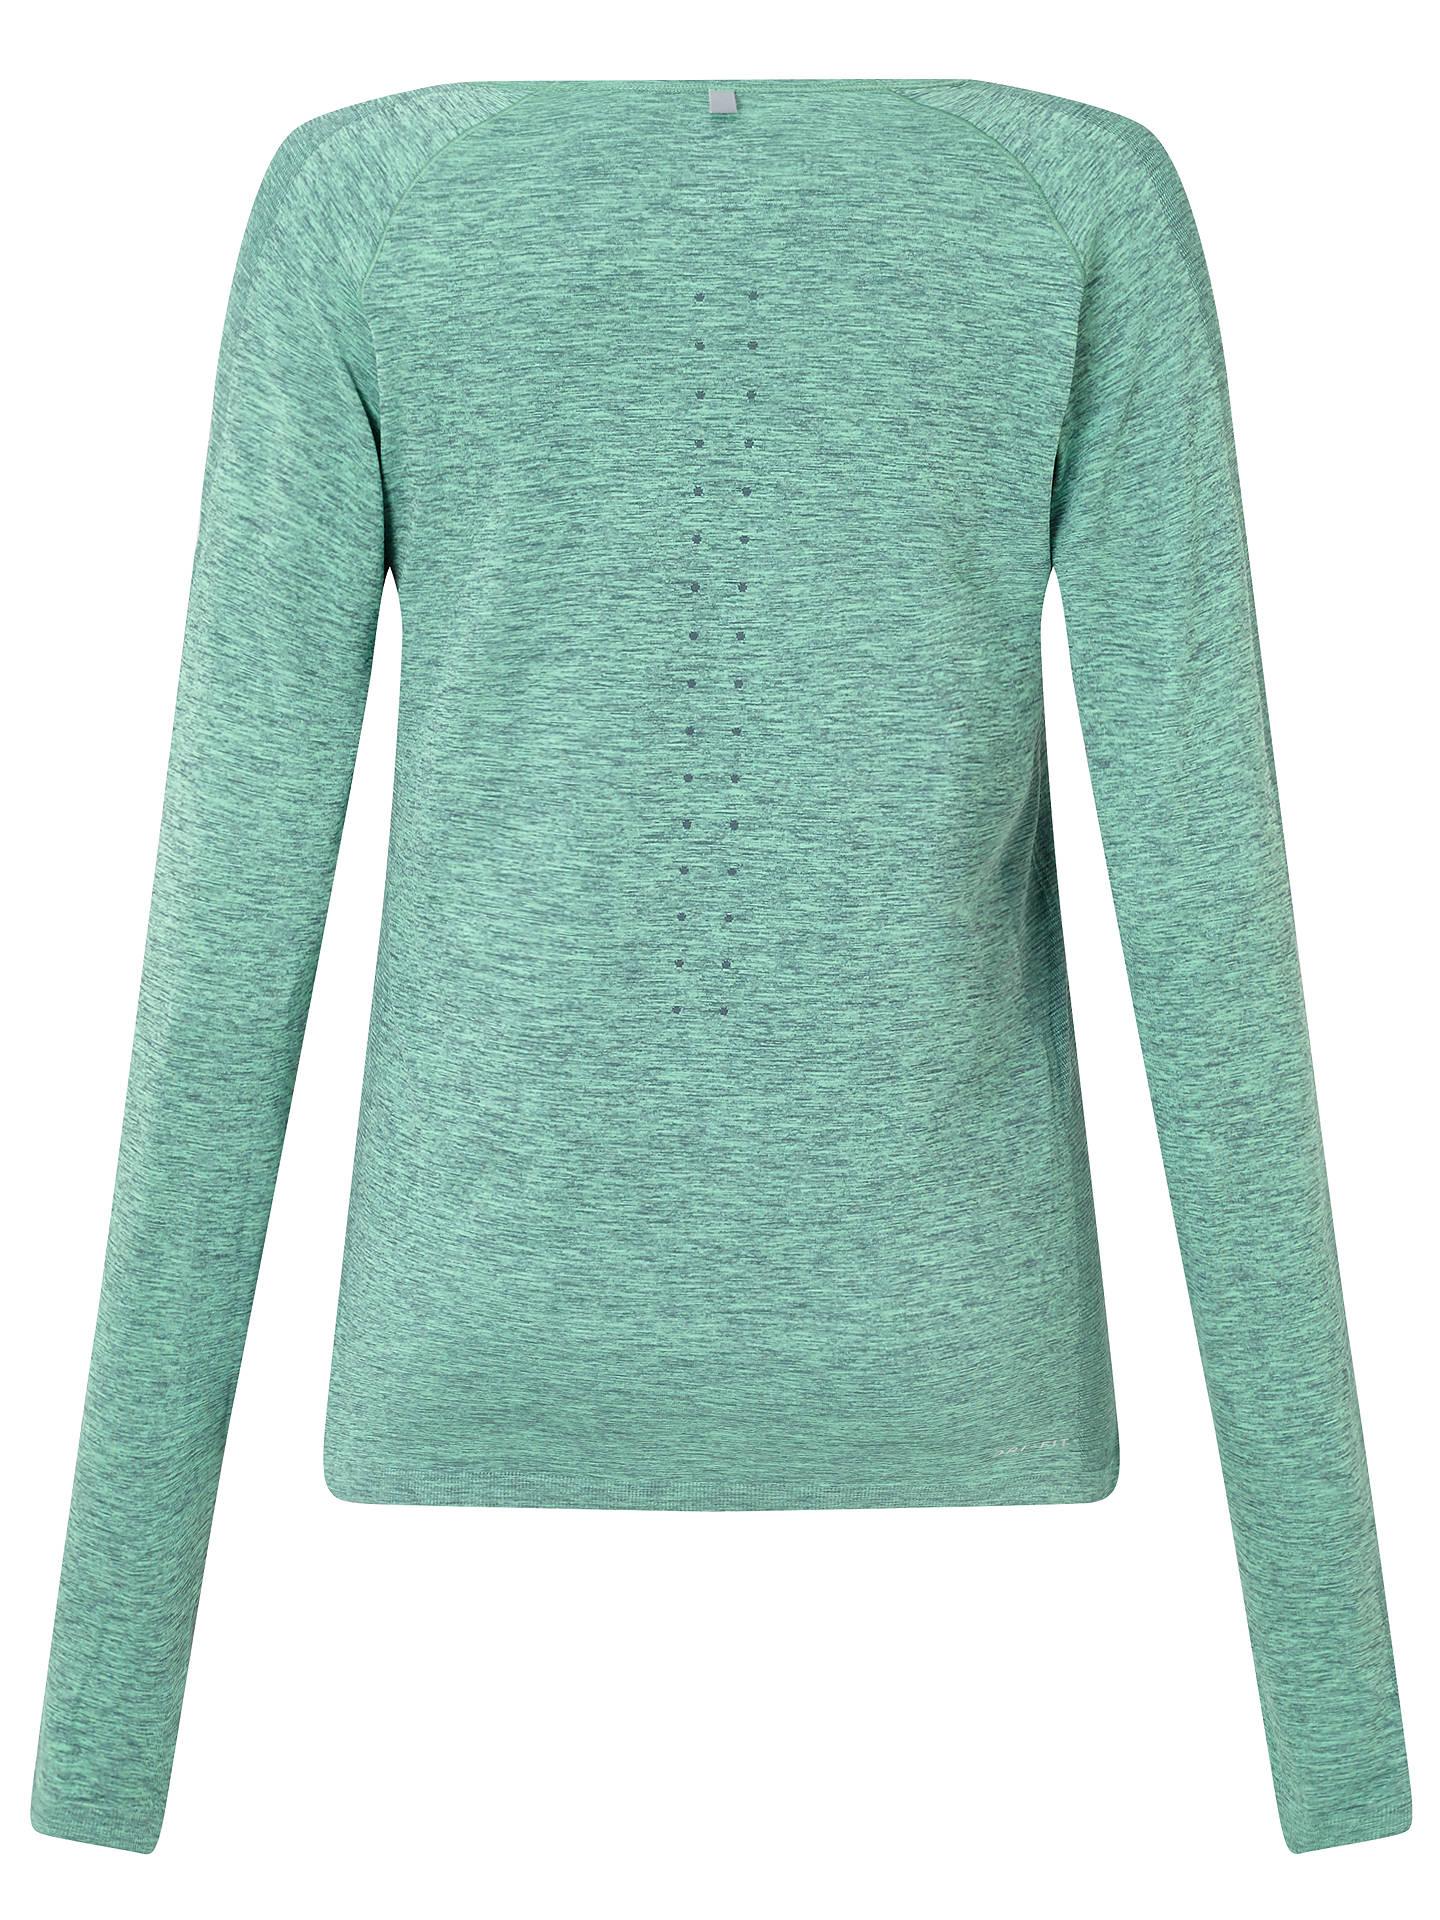 be5677225 ... Buy Nike Dri-FIT Knit Long Sleeve Running Top, Hasta/Green Glow, ...